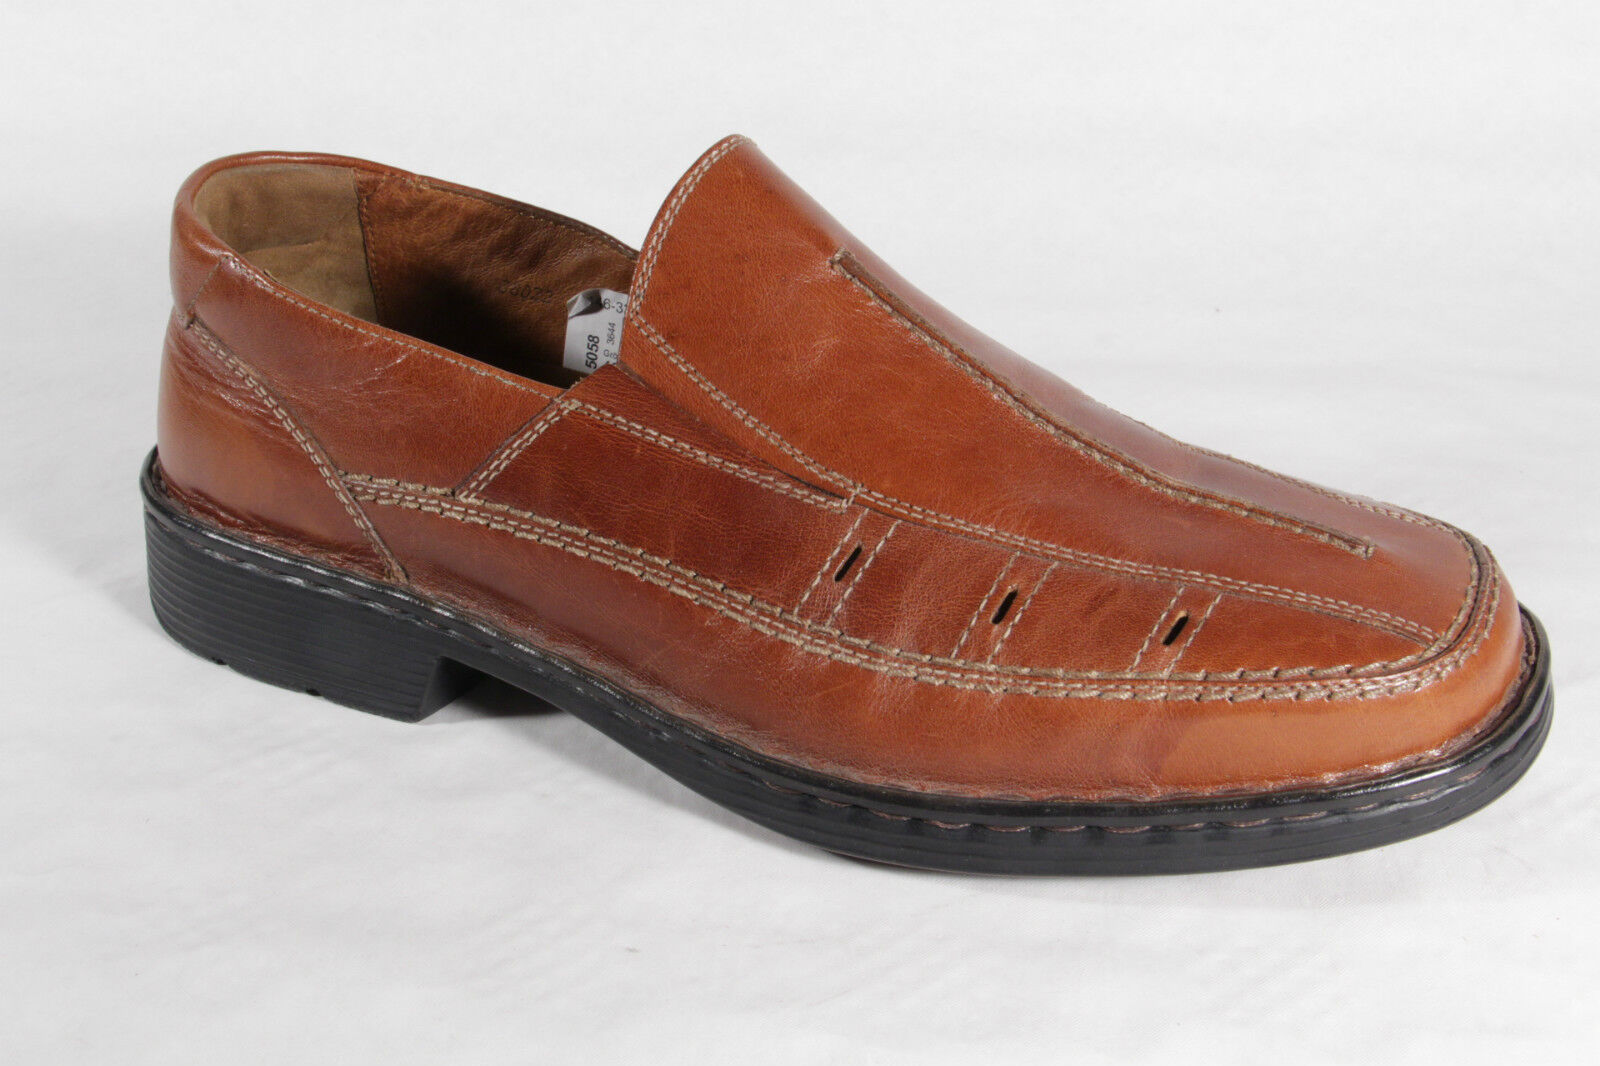 Seibel Slipper Leder Sneaker Halbschuh, braun, Leder Slipper Wechselfußbett  NEU 14073f